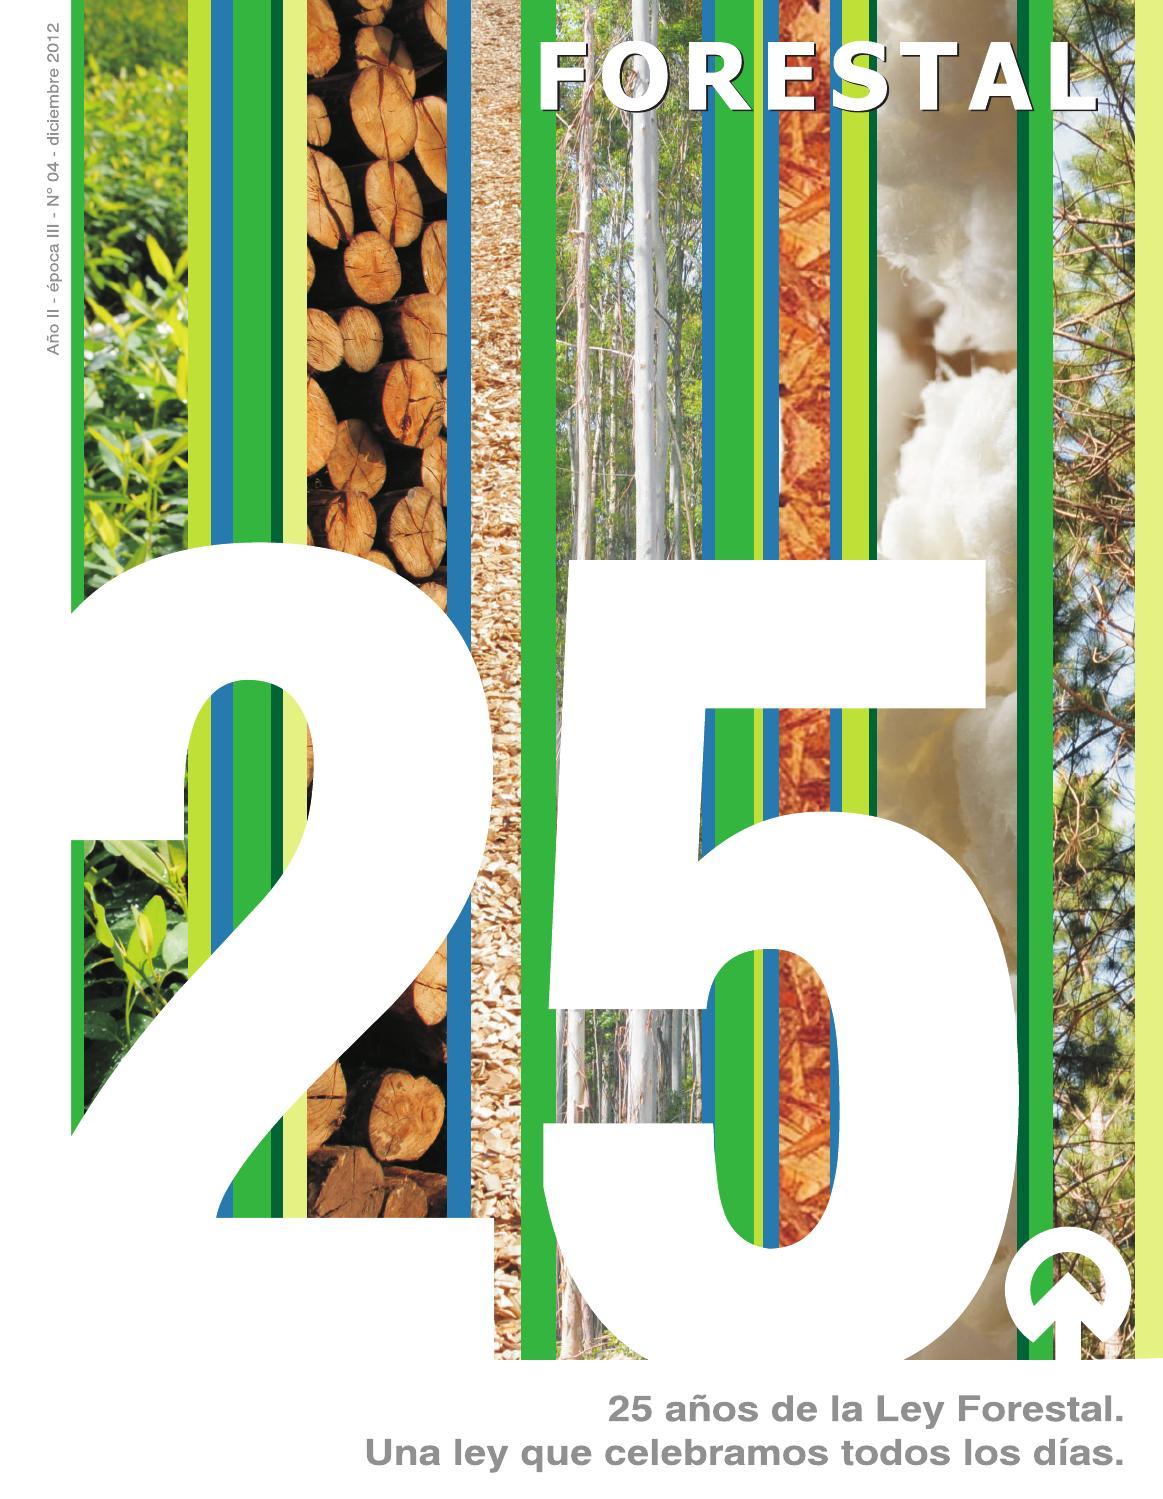 Revista Forestal #16 Diciembre 2016 by Revista Forestal - issuu